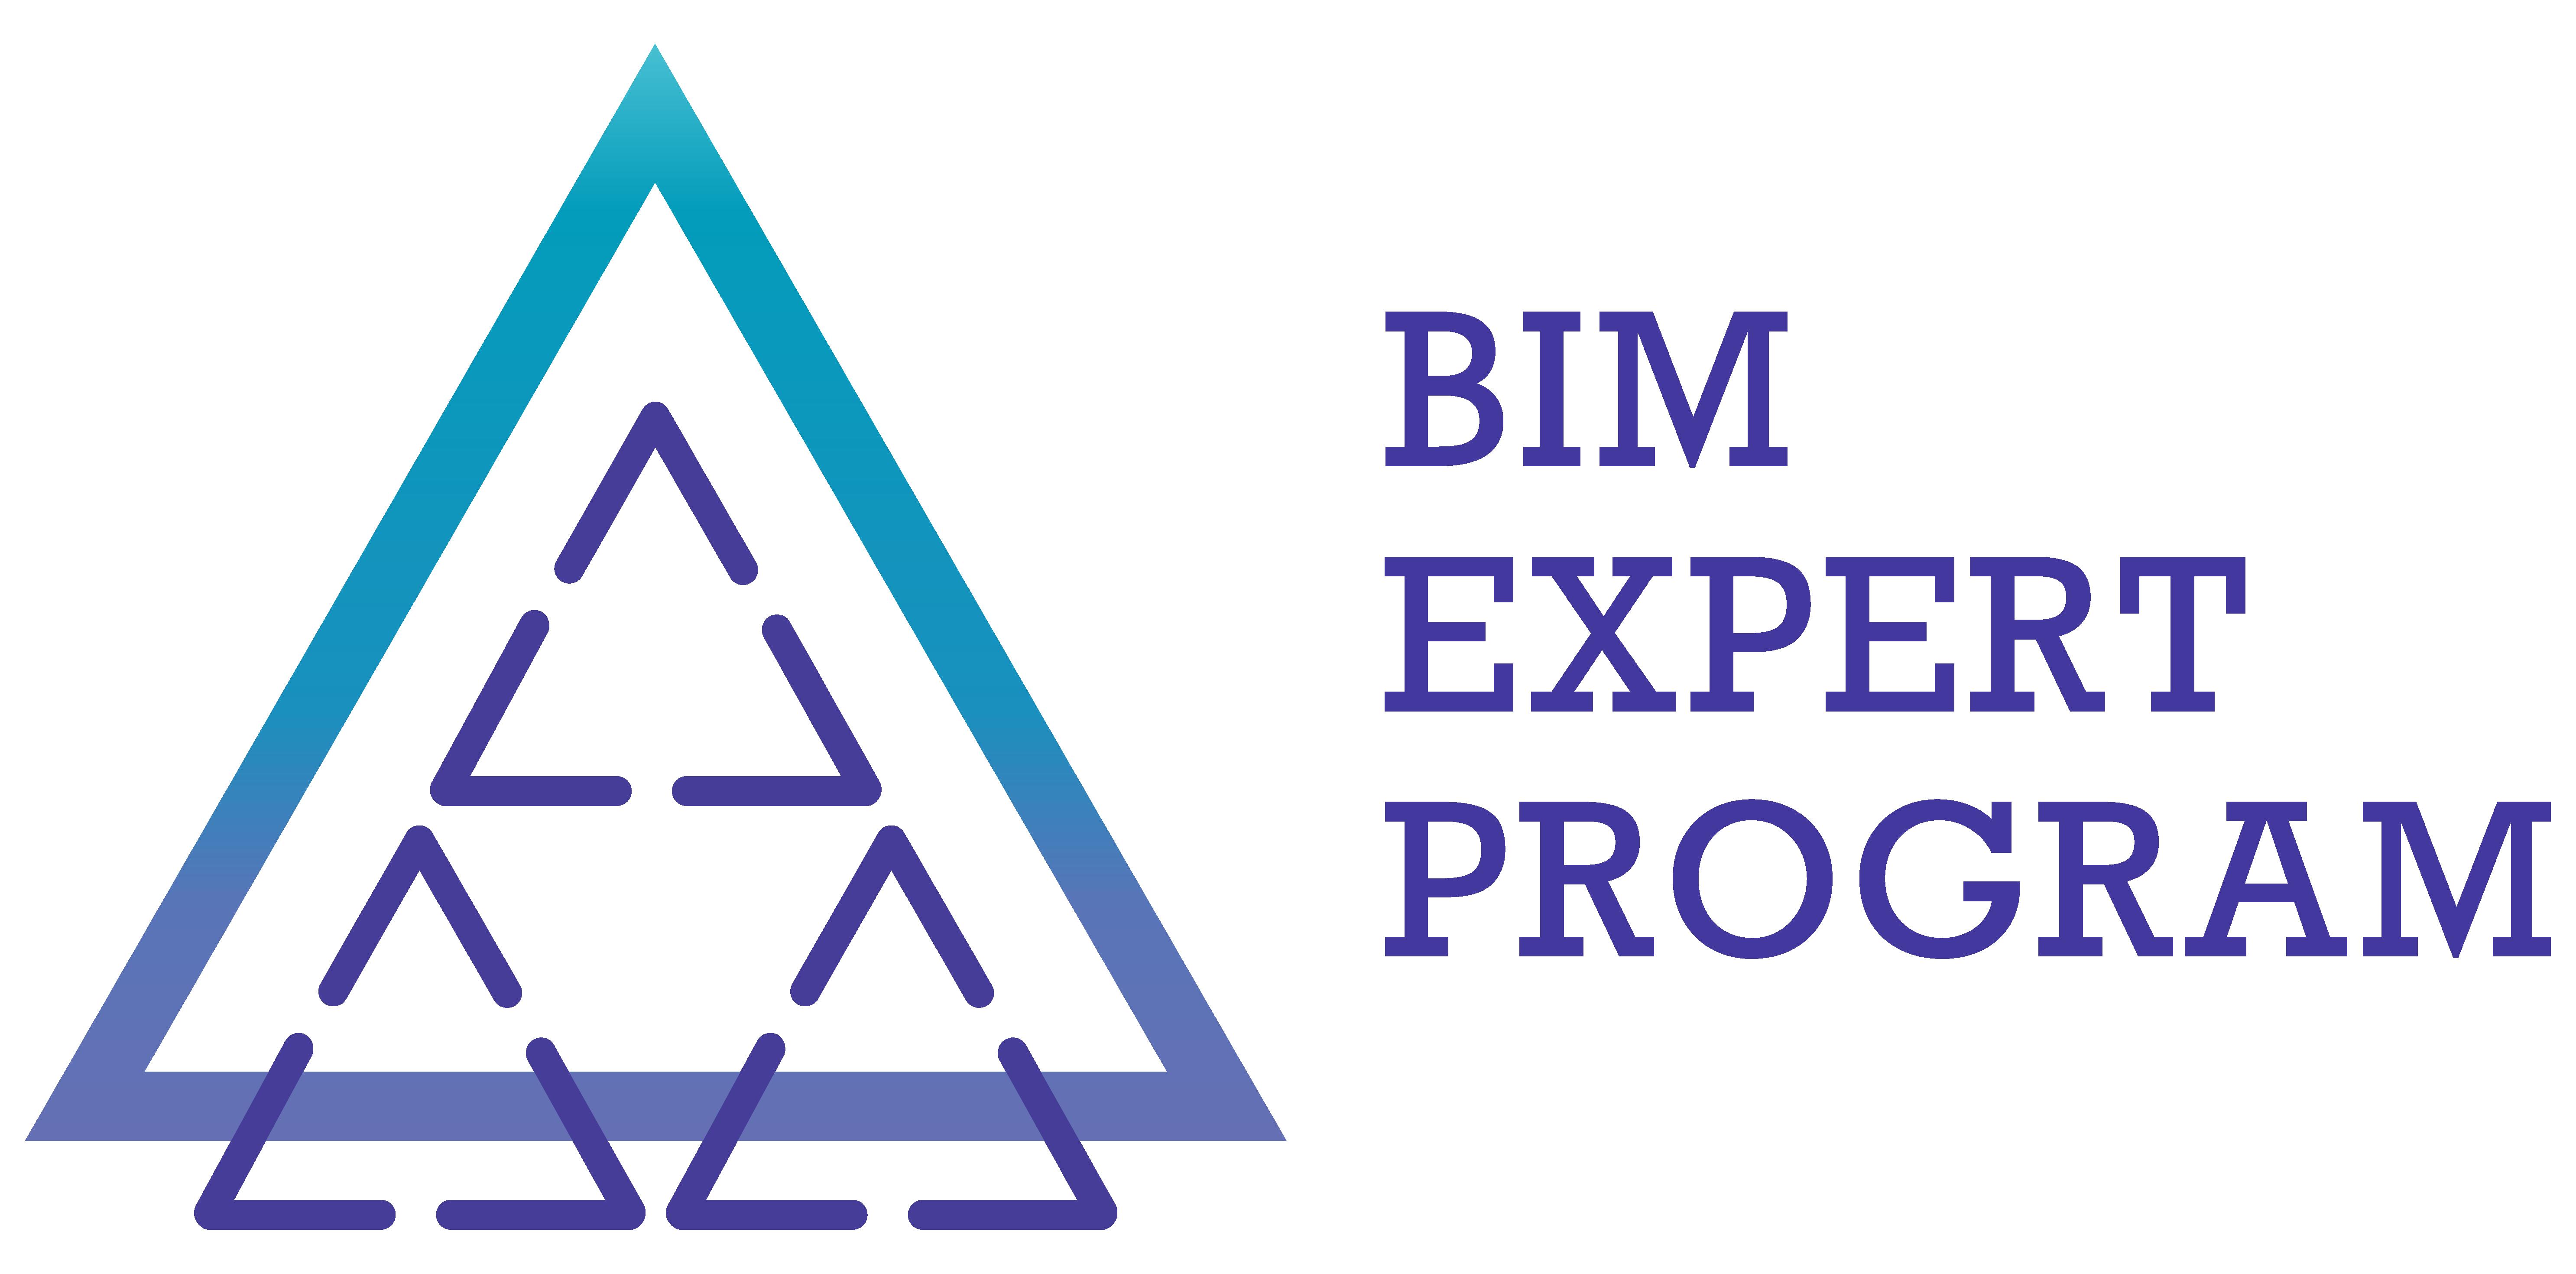 BIM Expert Program Logotipo